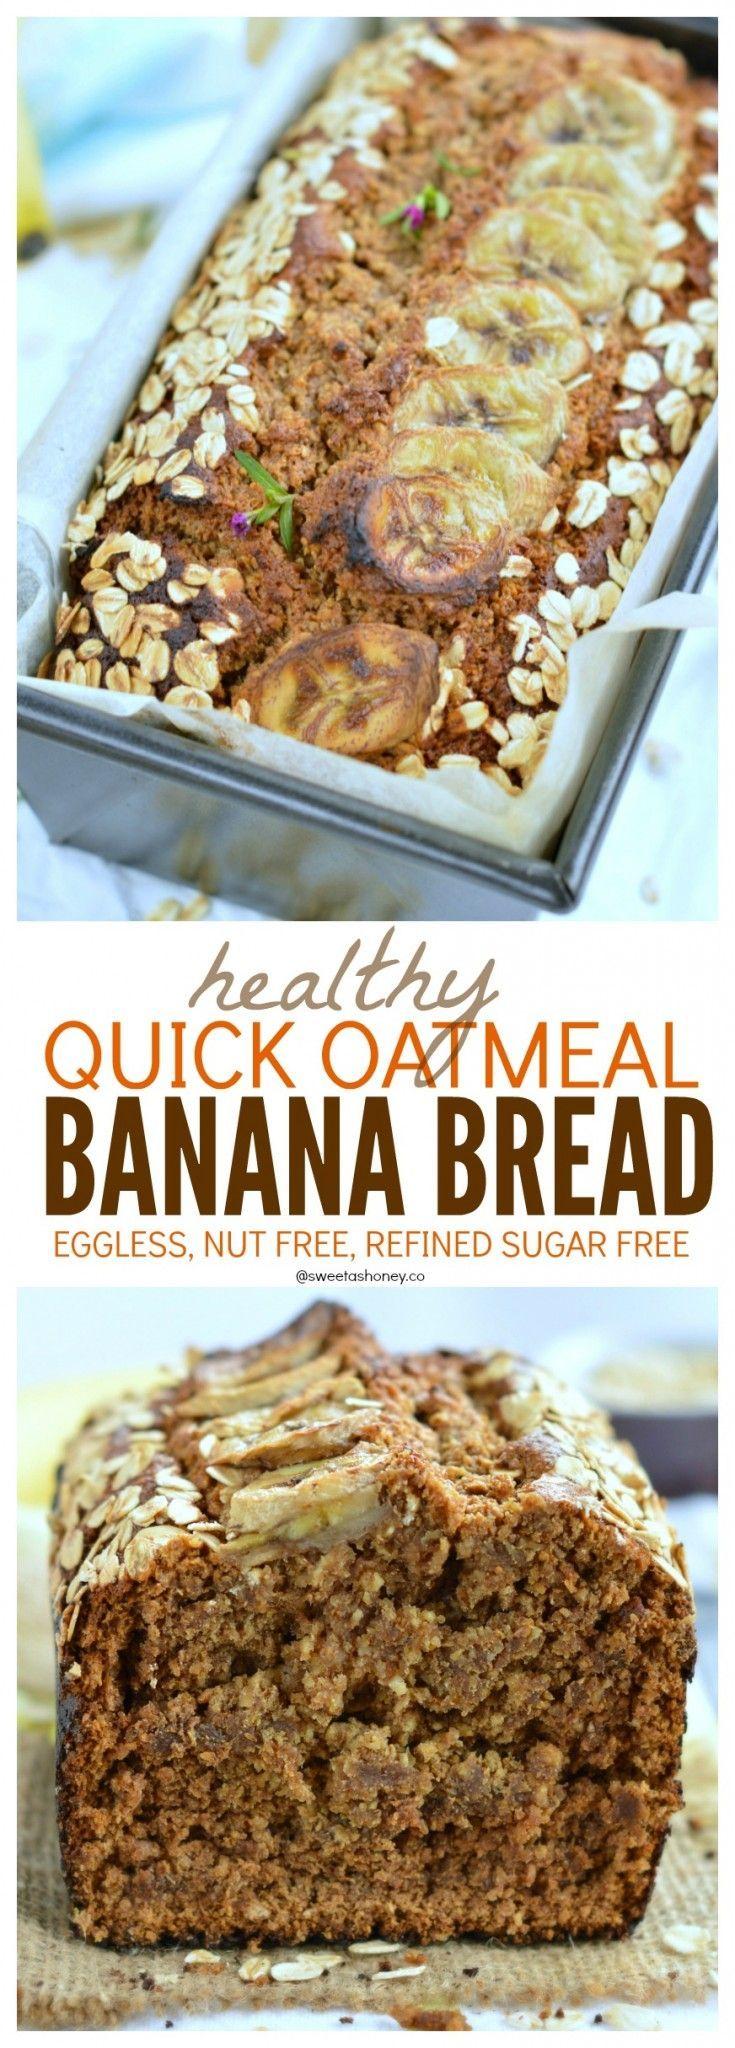 Oatmeal banana bread eggless banana bread recipe oatmeal oatmeal banana bread eggless banana bread forumfinder Images